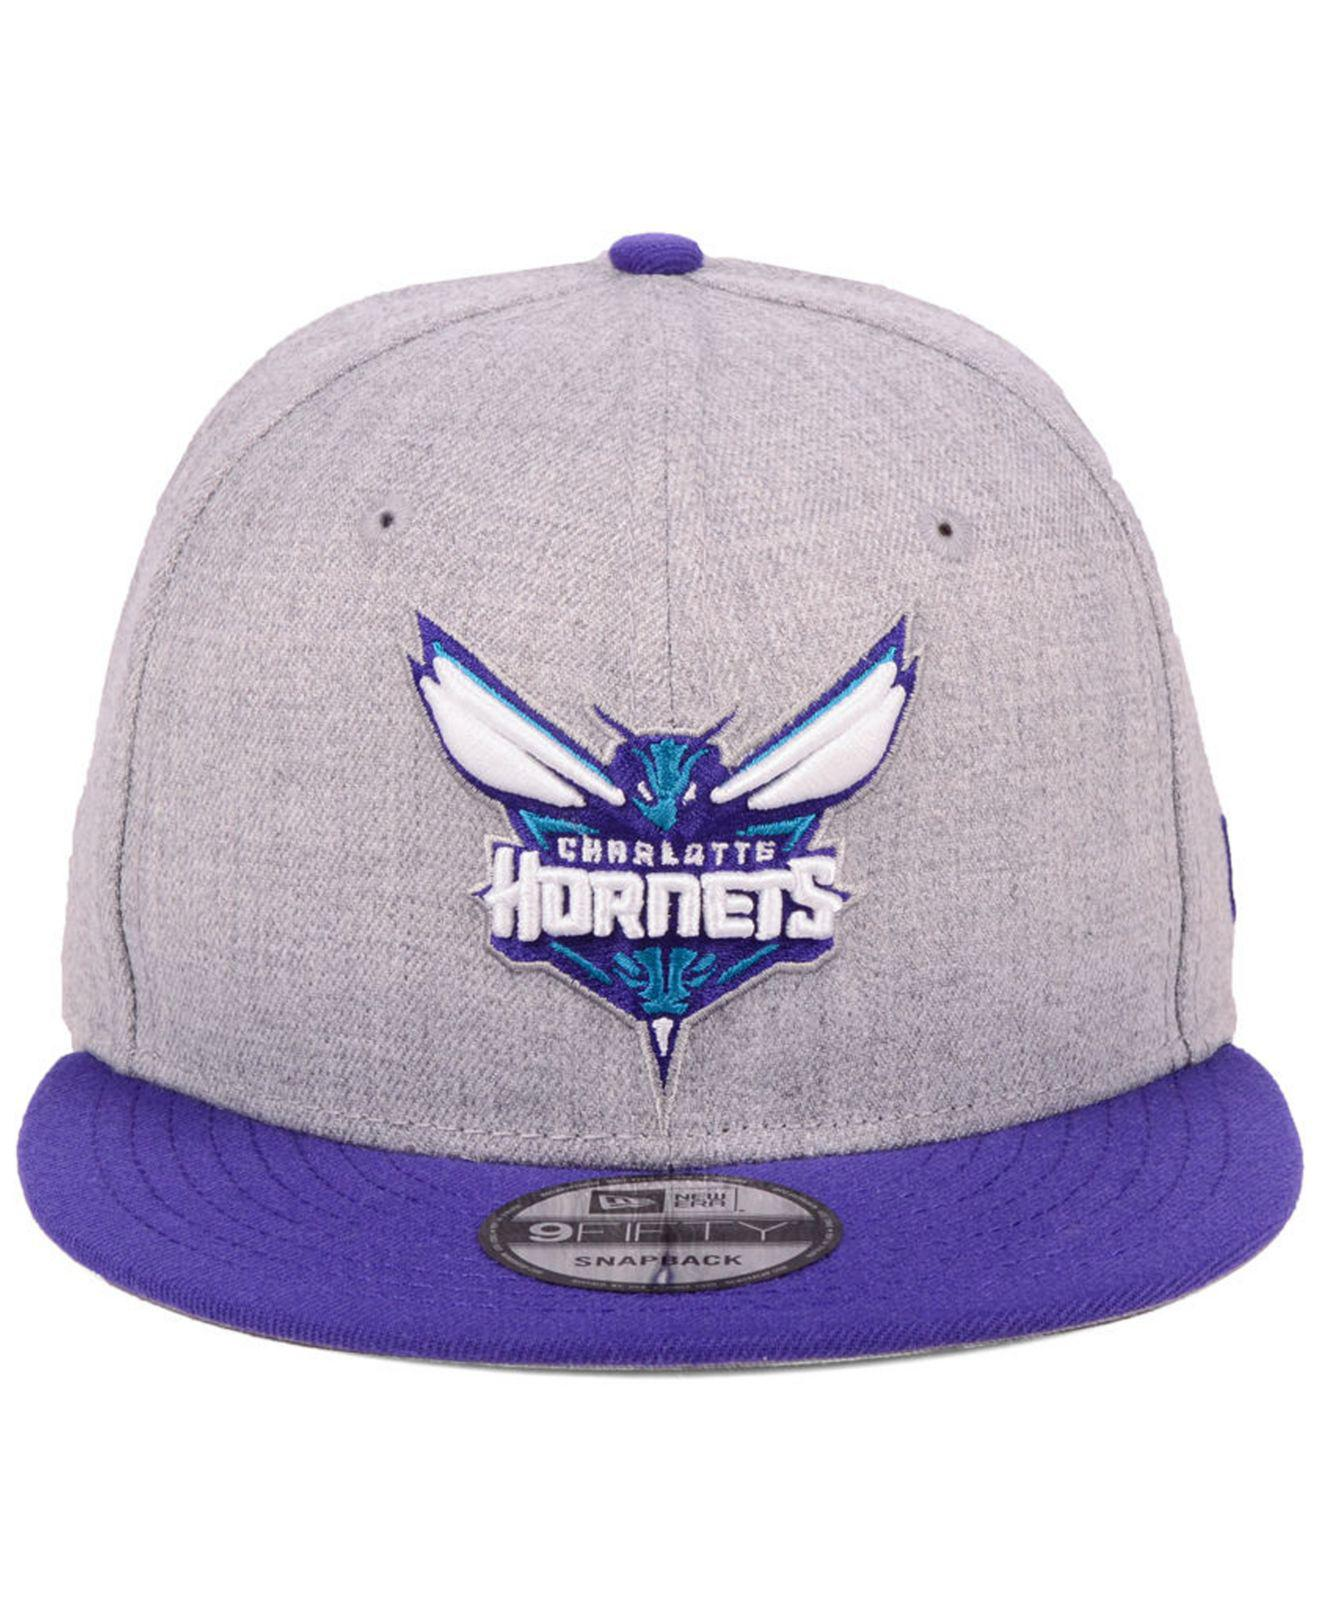 san francisco 4f2a4 8b61a ... promo code lyst ktz charlotte hornets heather gray 9fifty snapback cap  in purple for men 0b8ff